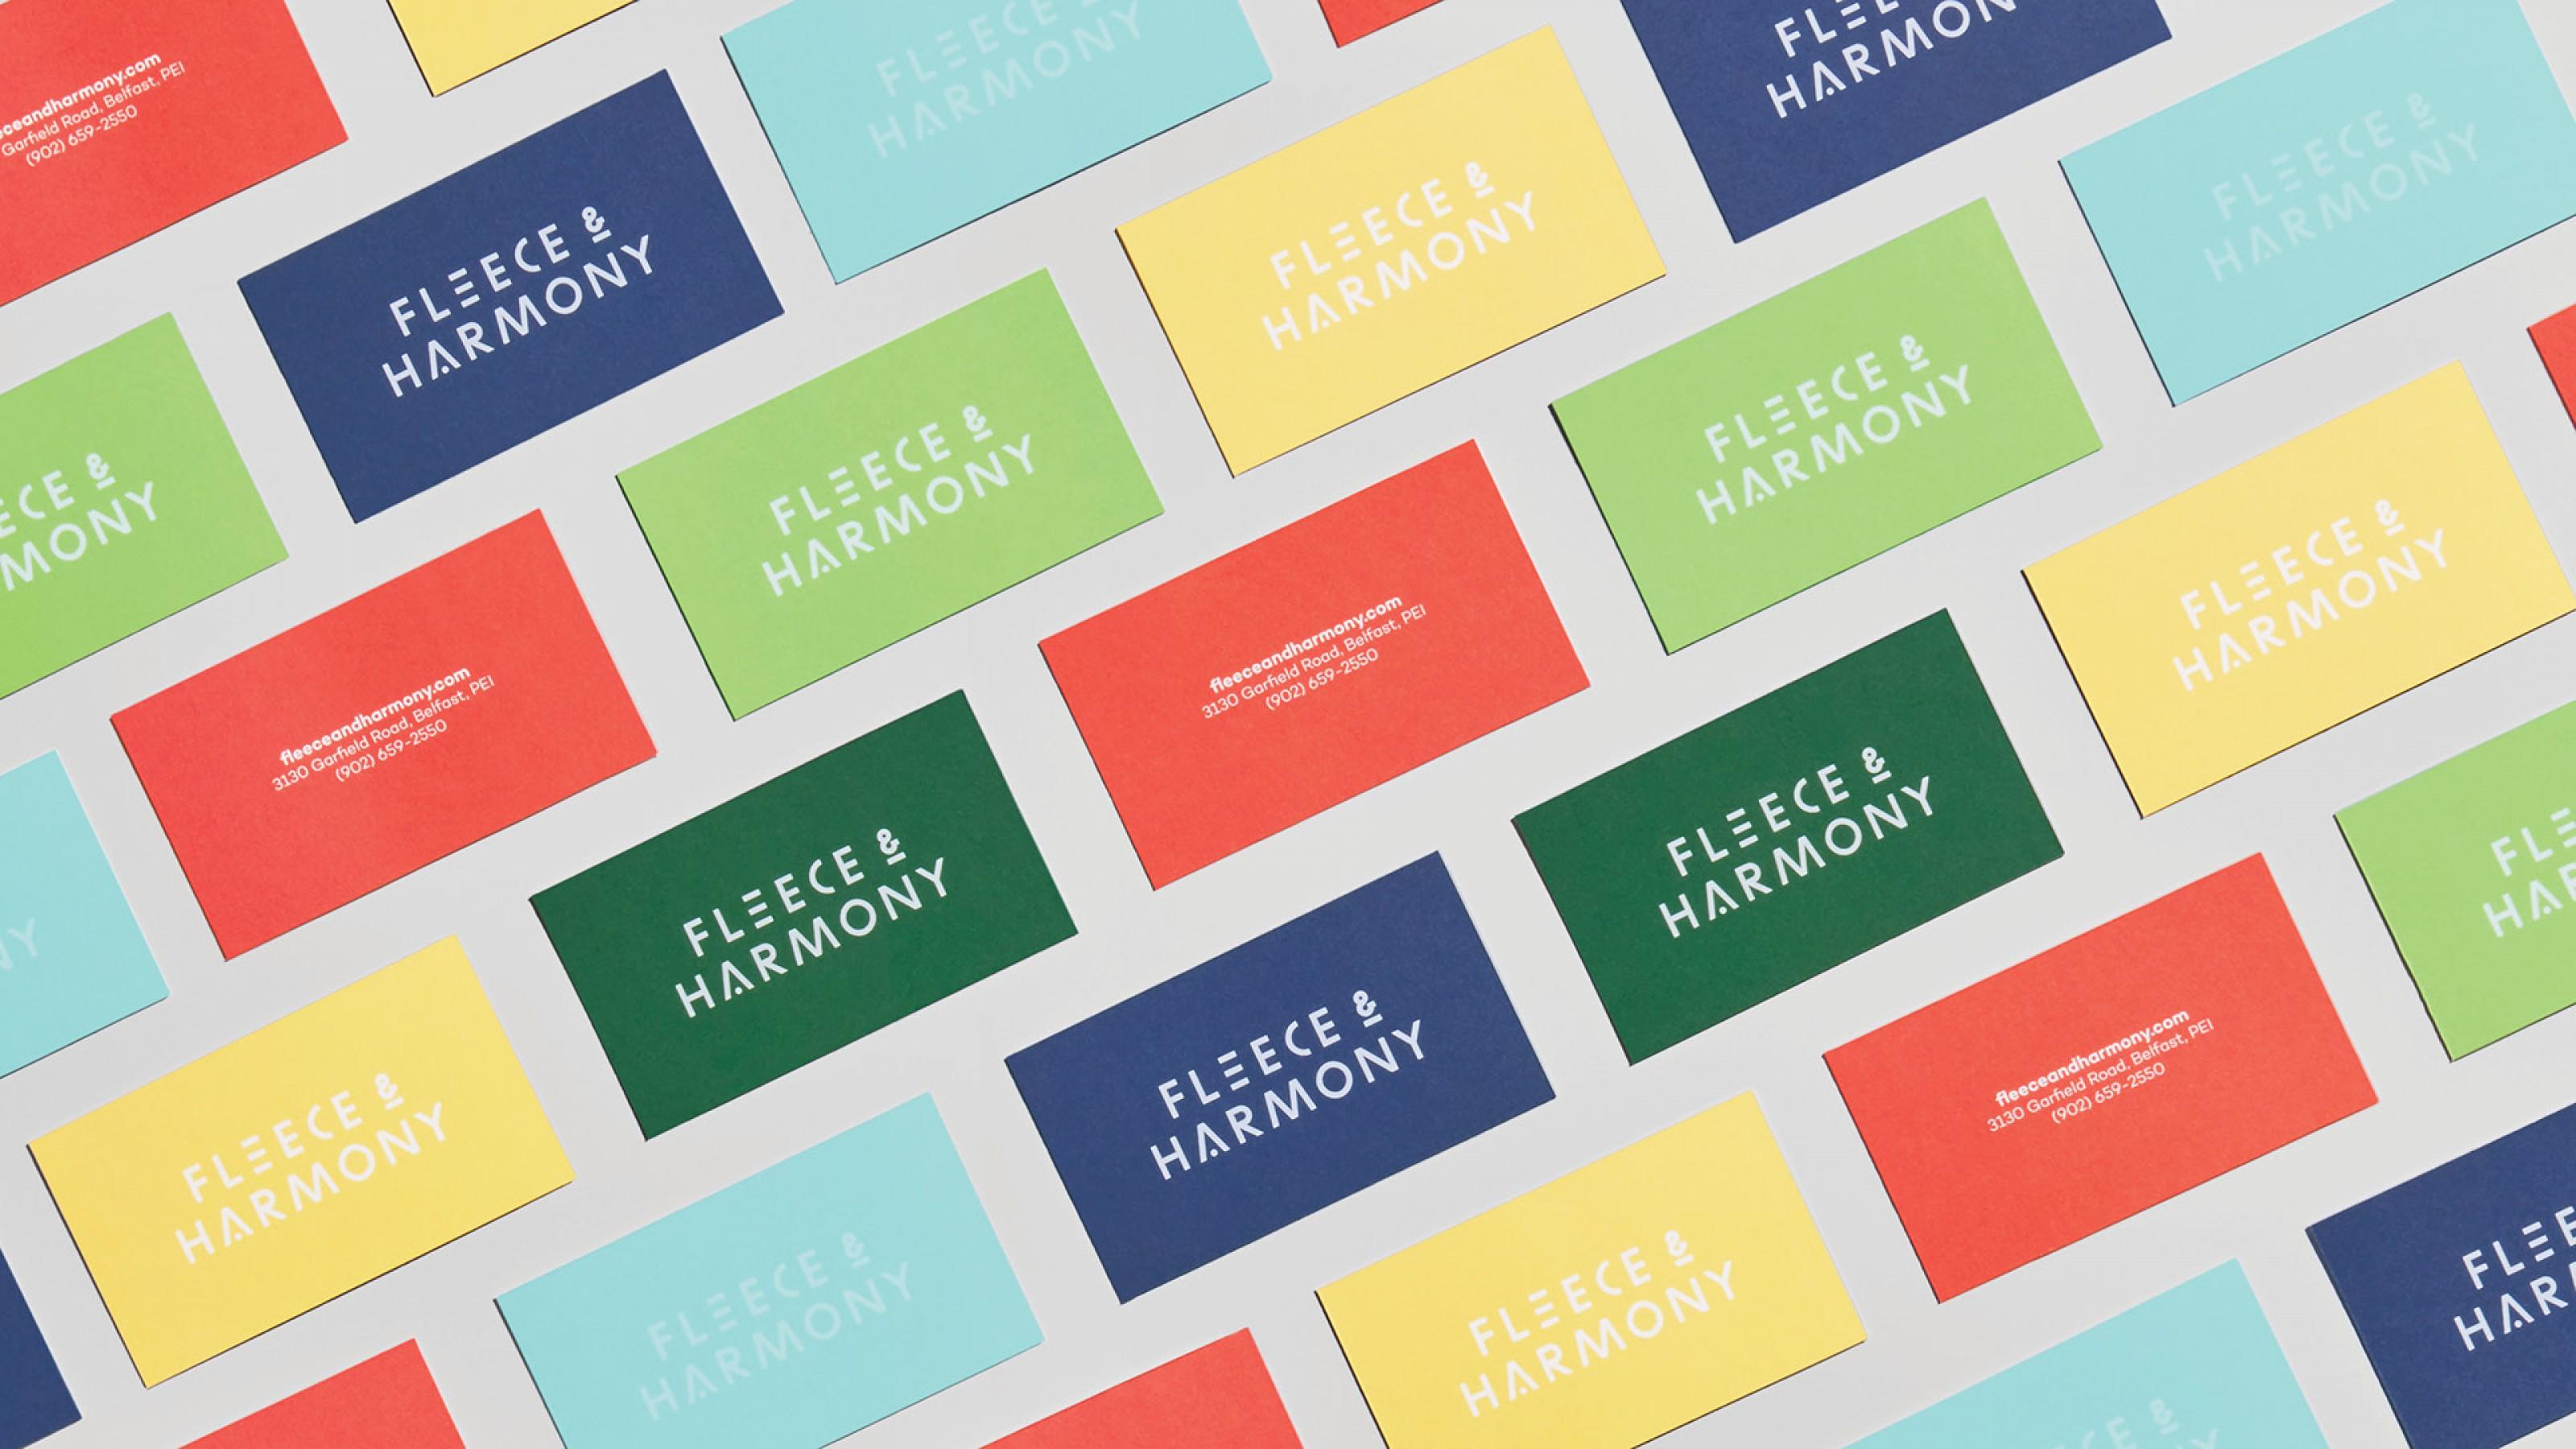 Fleece & Harmony - Image de marque - TUX   Fearless Partner in Creativity